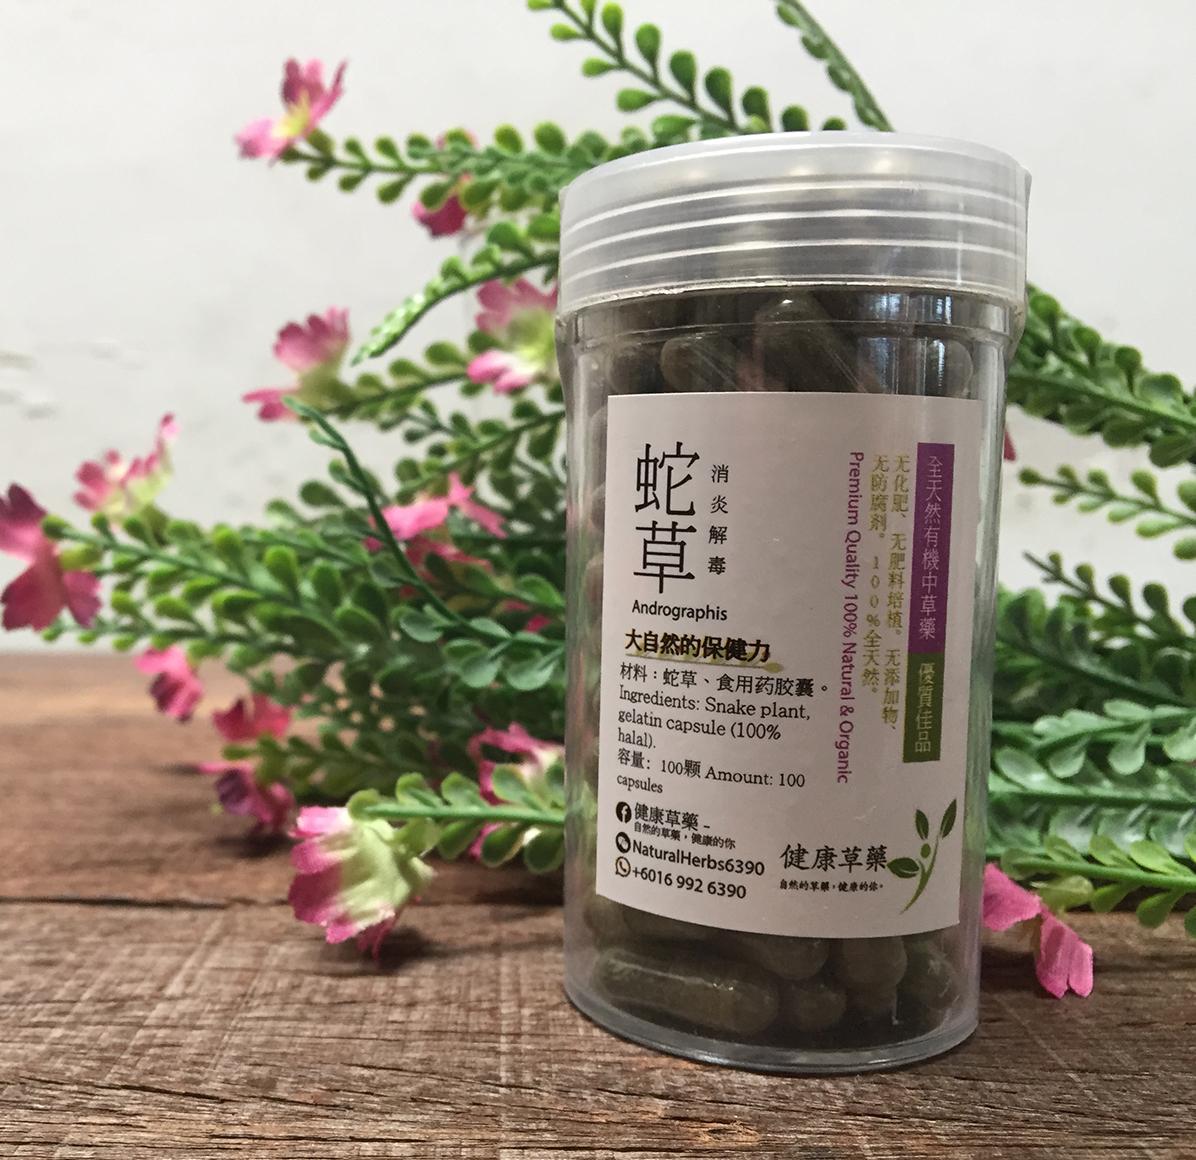 穿心蓮 蛇草 Andrographis Paniculata – Hempedu Bumi